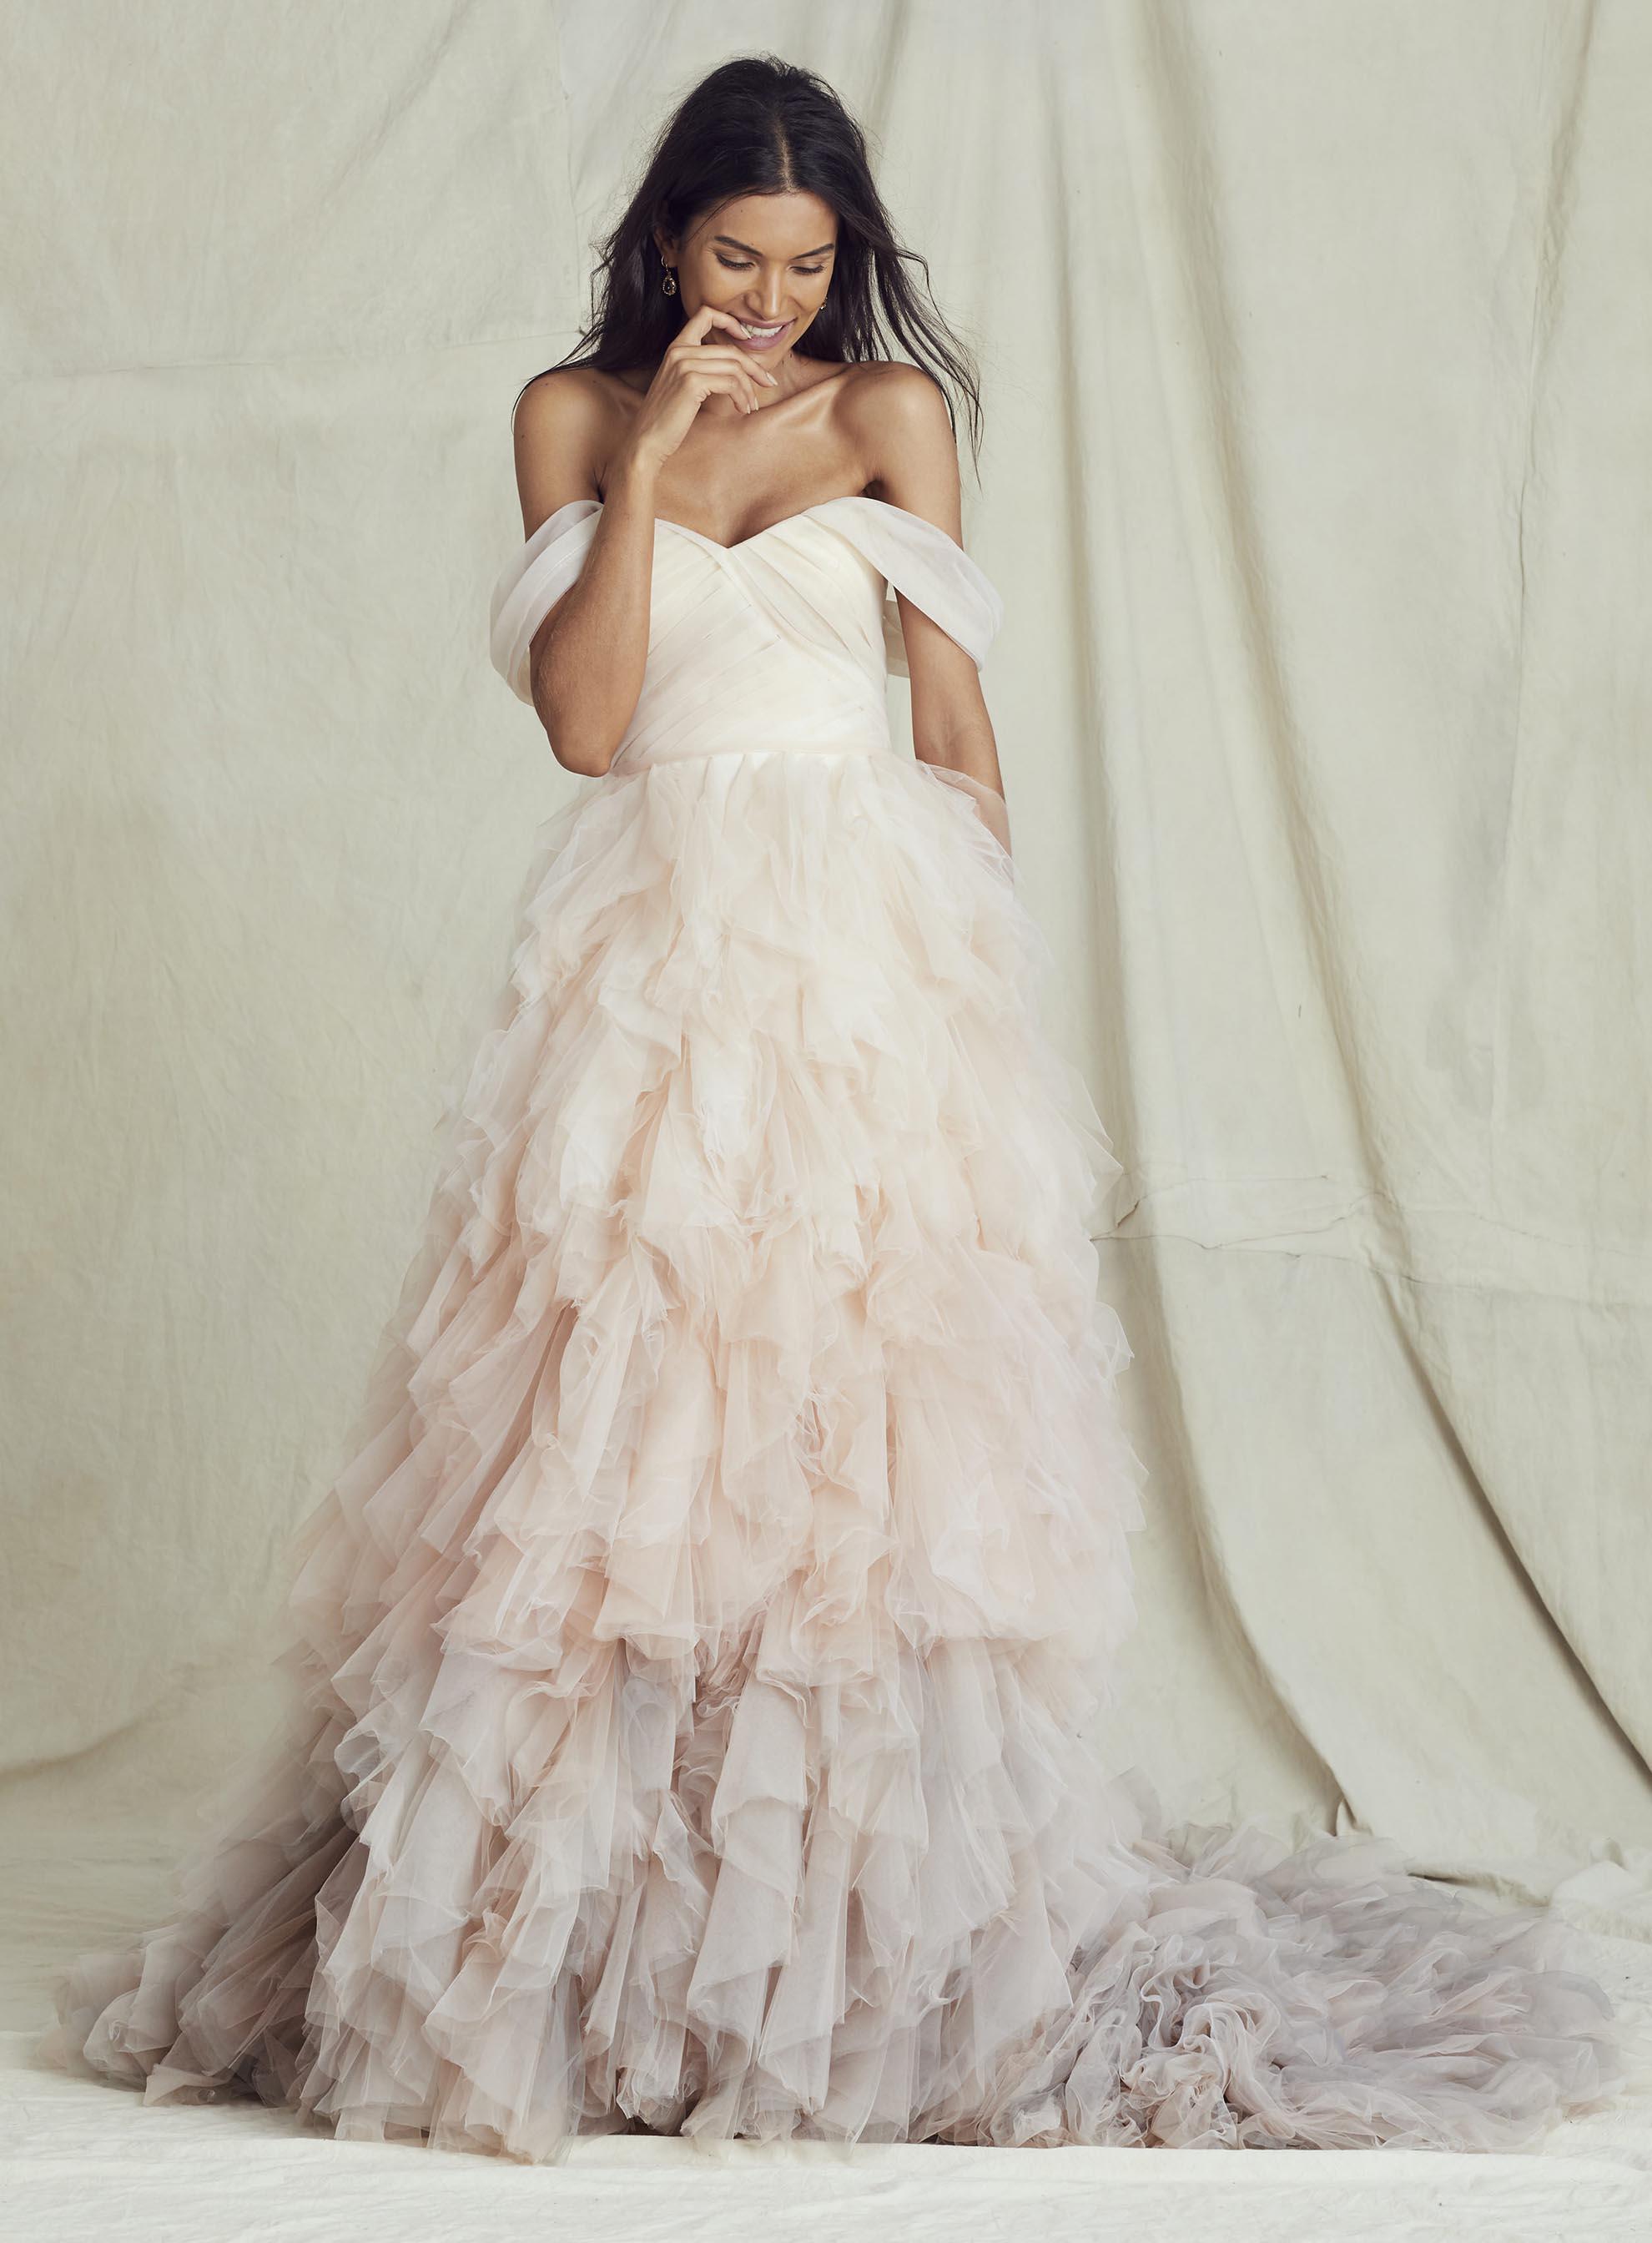 912545a59130 Designer Wedding Dresses | Beaconsfield | Ellie Sanderson